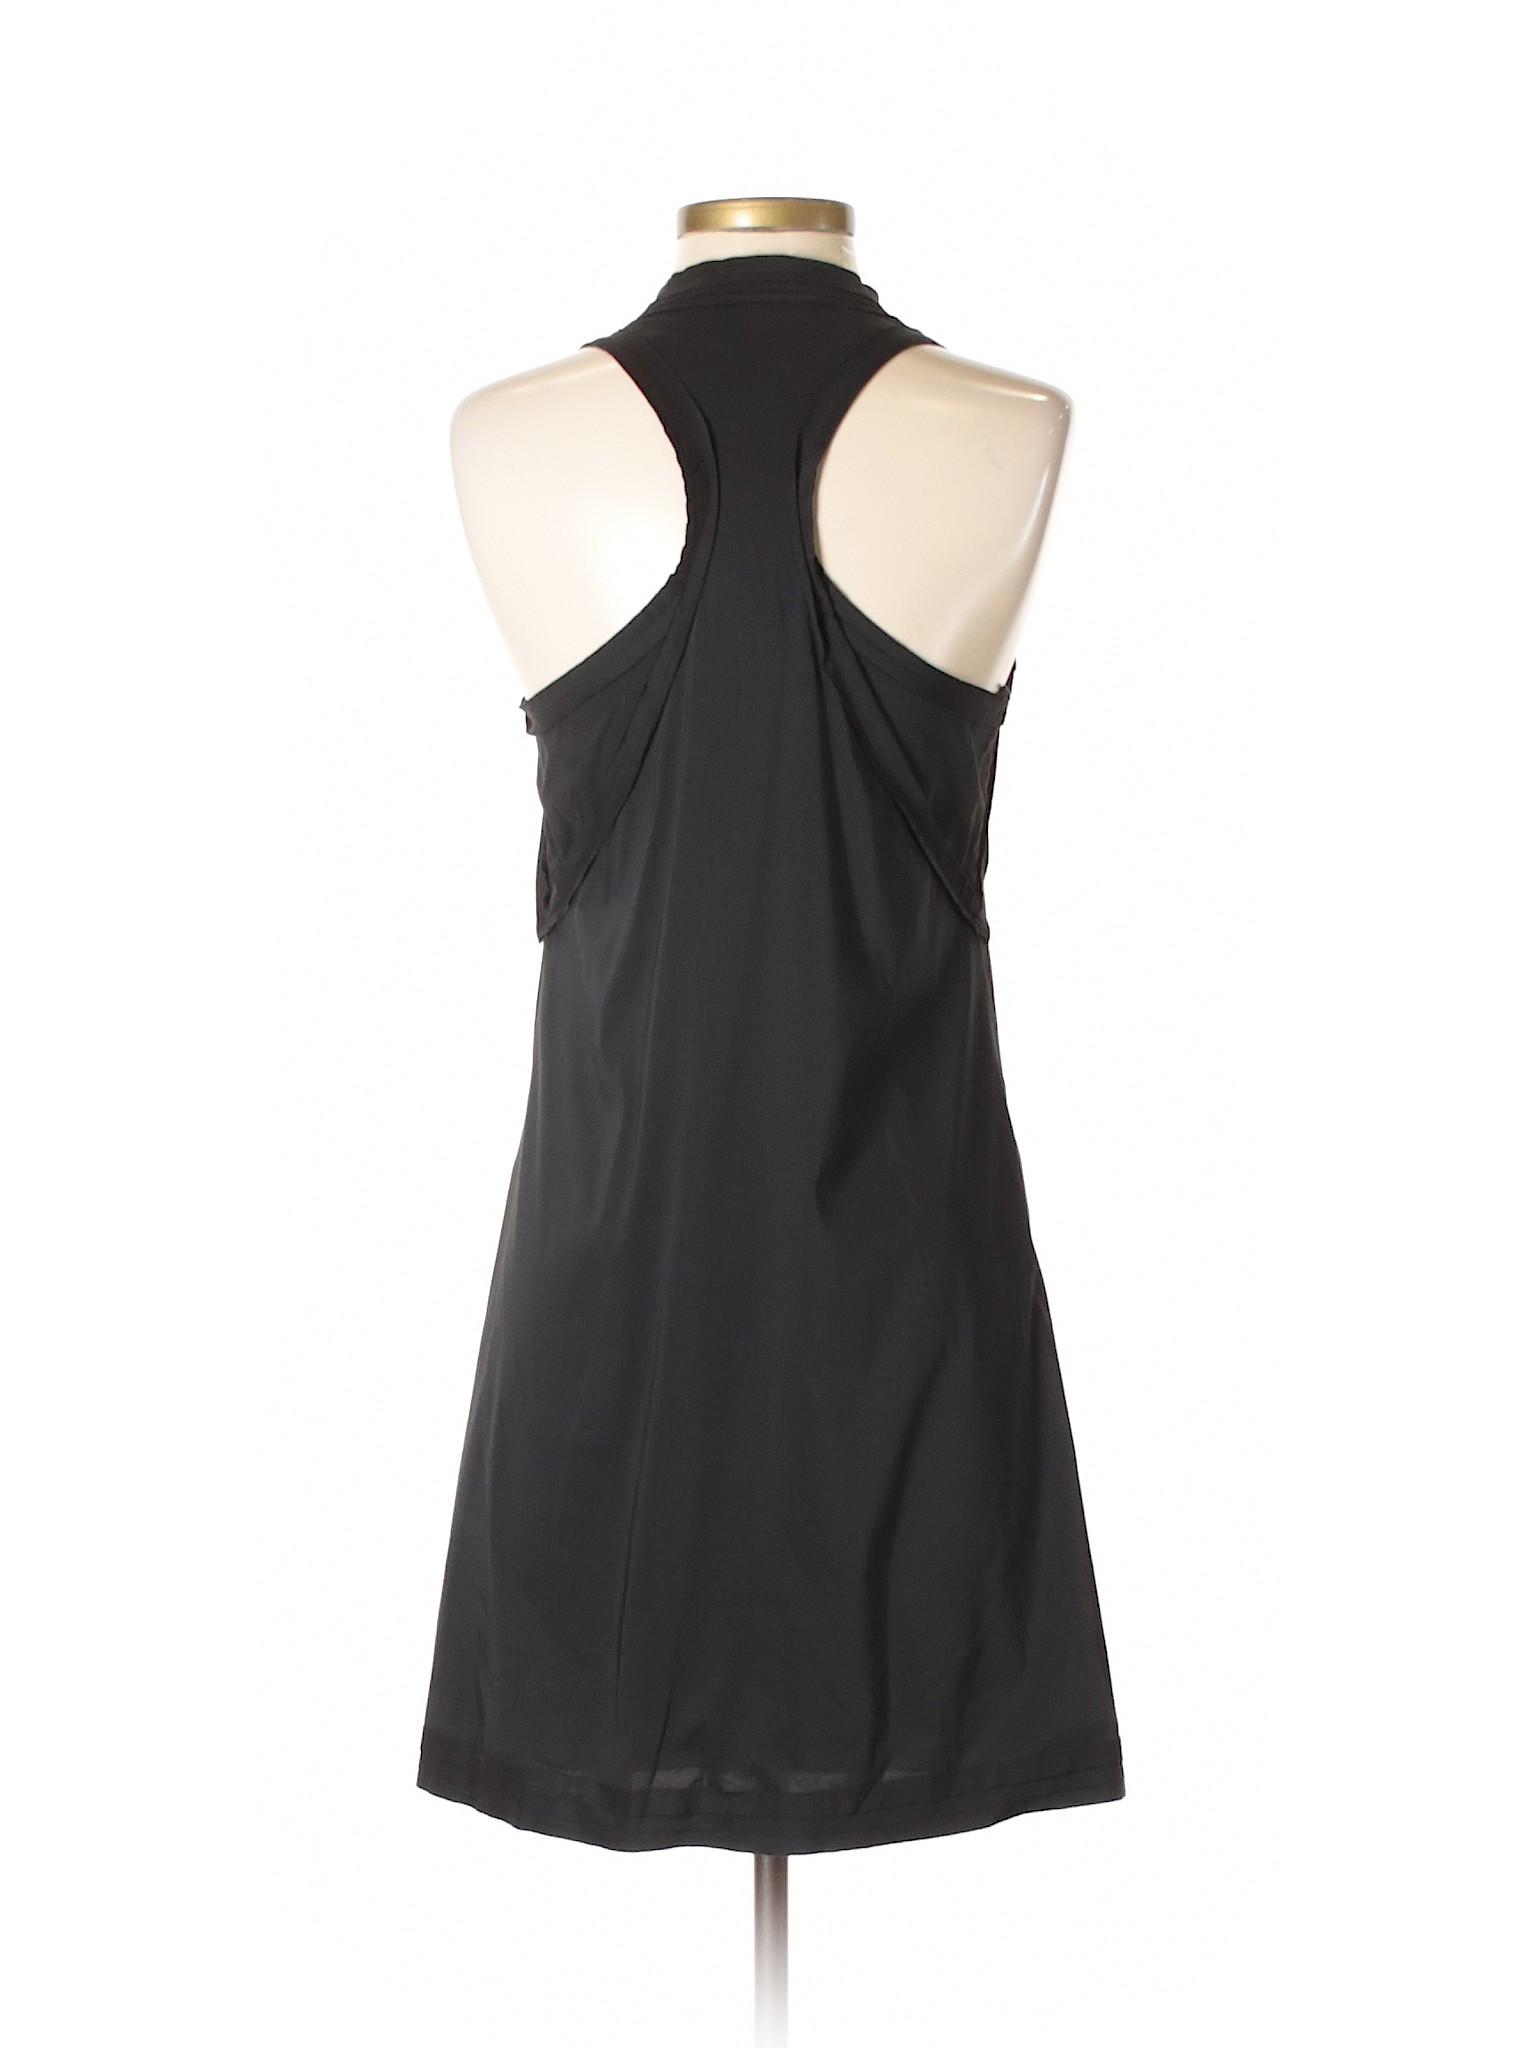 Casual winter Boutique Casual Boutique BCBGMAXAZRIA BCBGMAXAZRIA winter Dress Dress wqTa0H7